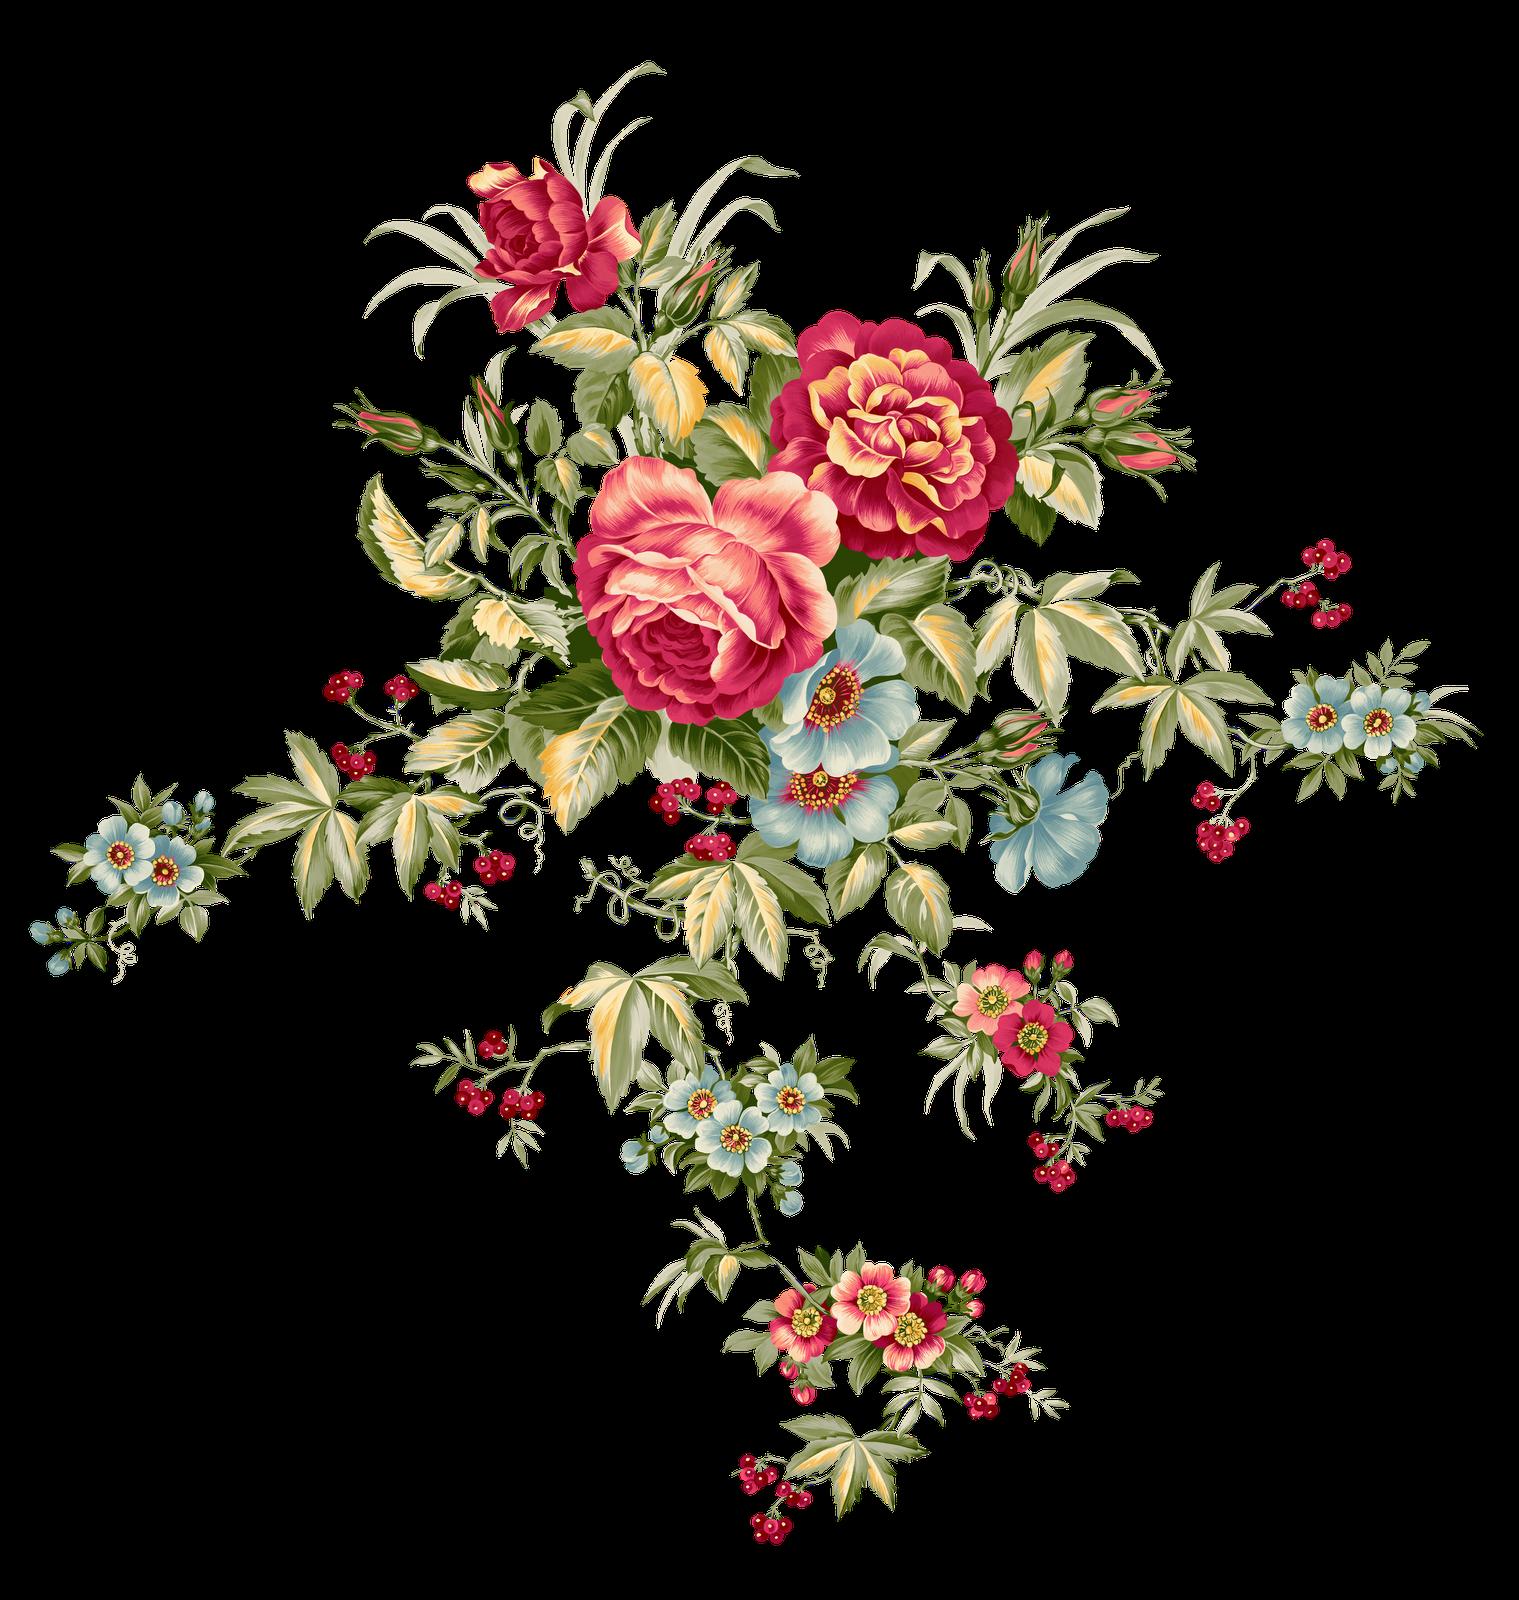 Vintage flower png. Syedimran backgrounds pinterest and